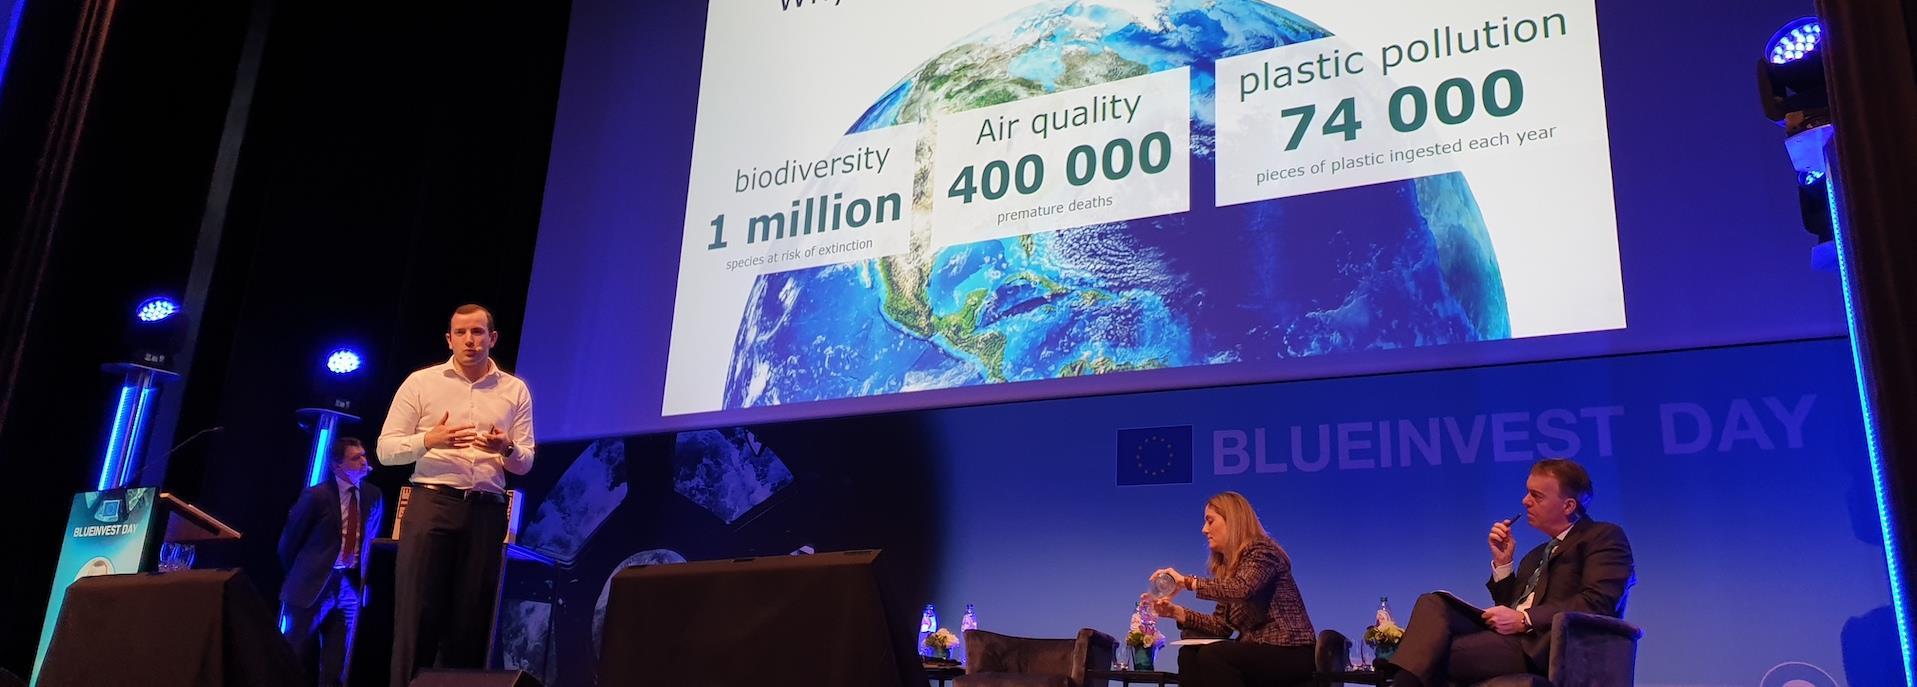 Speaker at Blue Invest Day